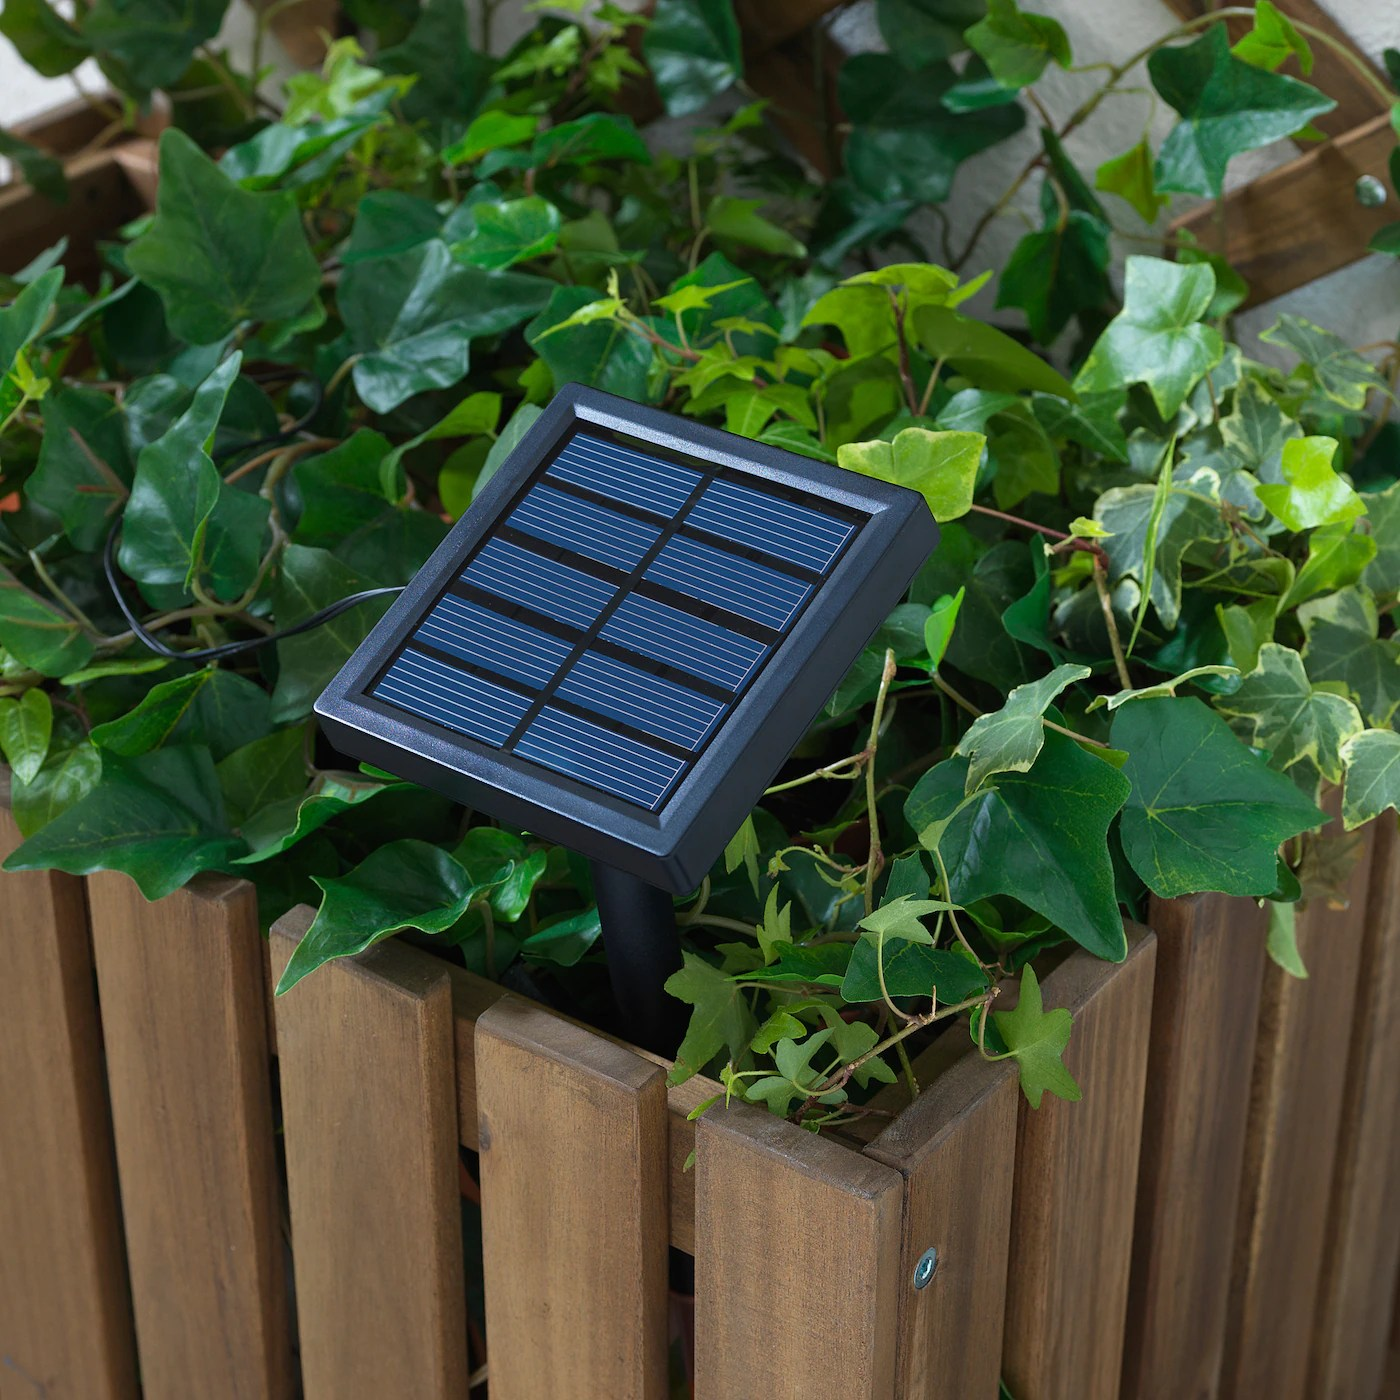 Solarvet Guirlande Lumineuse A Led 24 Amp Exterieur Energie Solaire Ballon Blanc Ikea